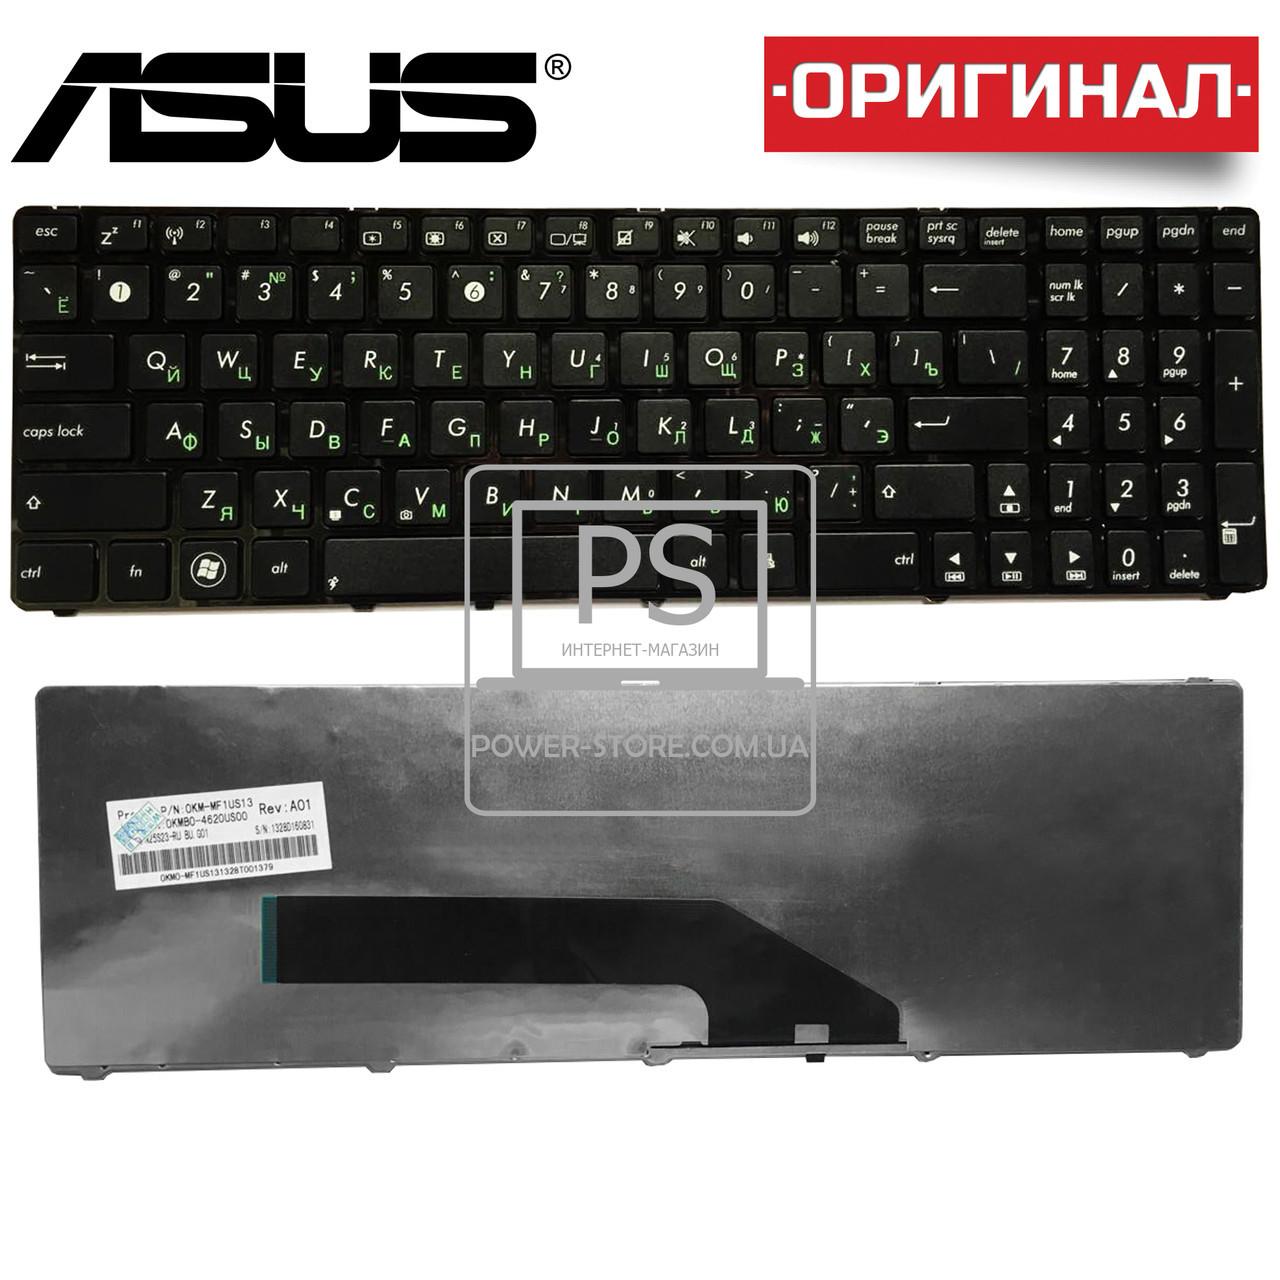 Клавиатура для ноутбука ASUS  V090562BK1, V090562BS1, V1111462CS2,